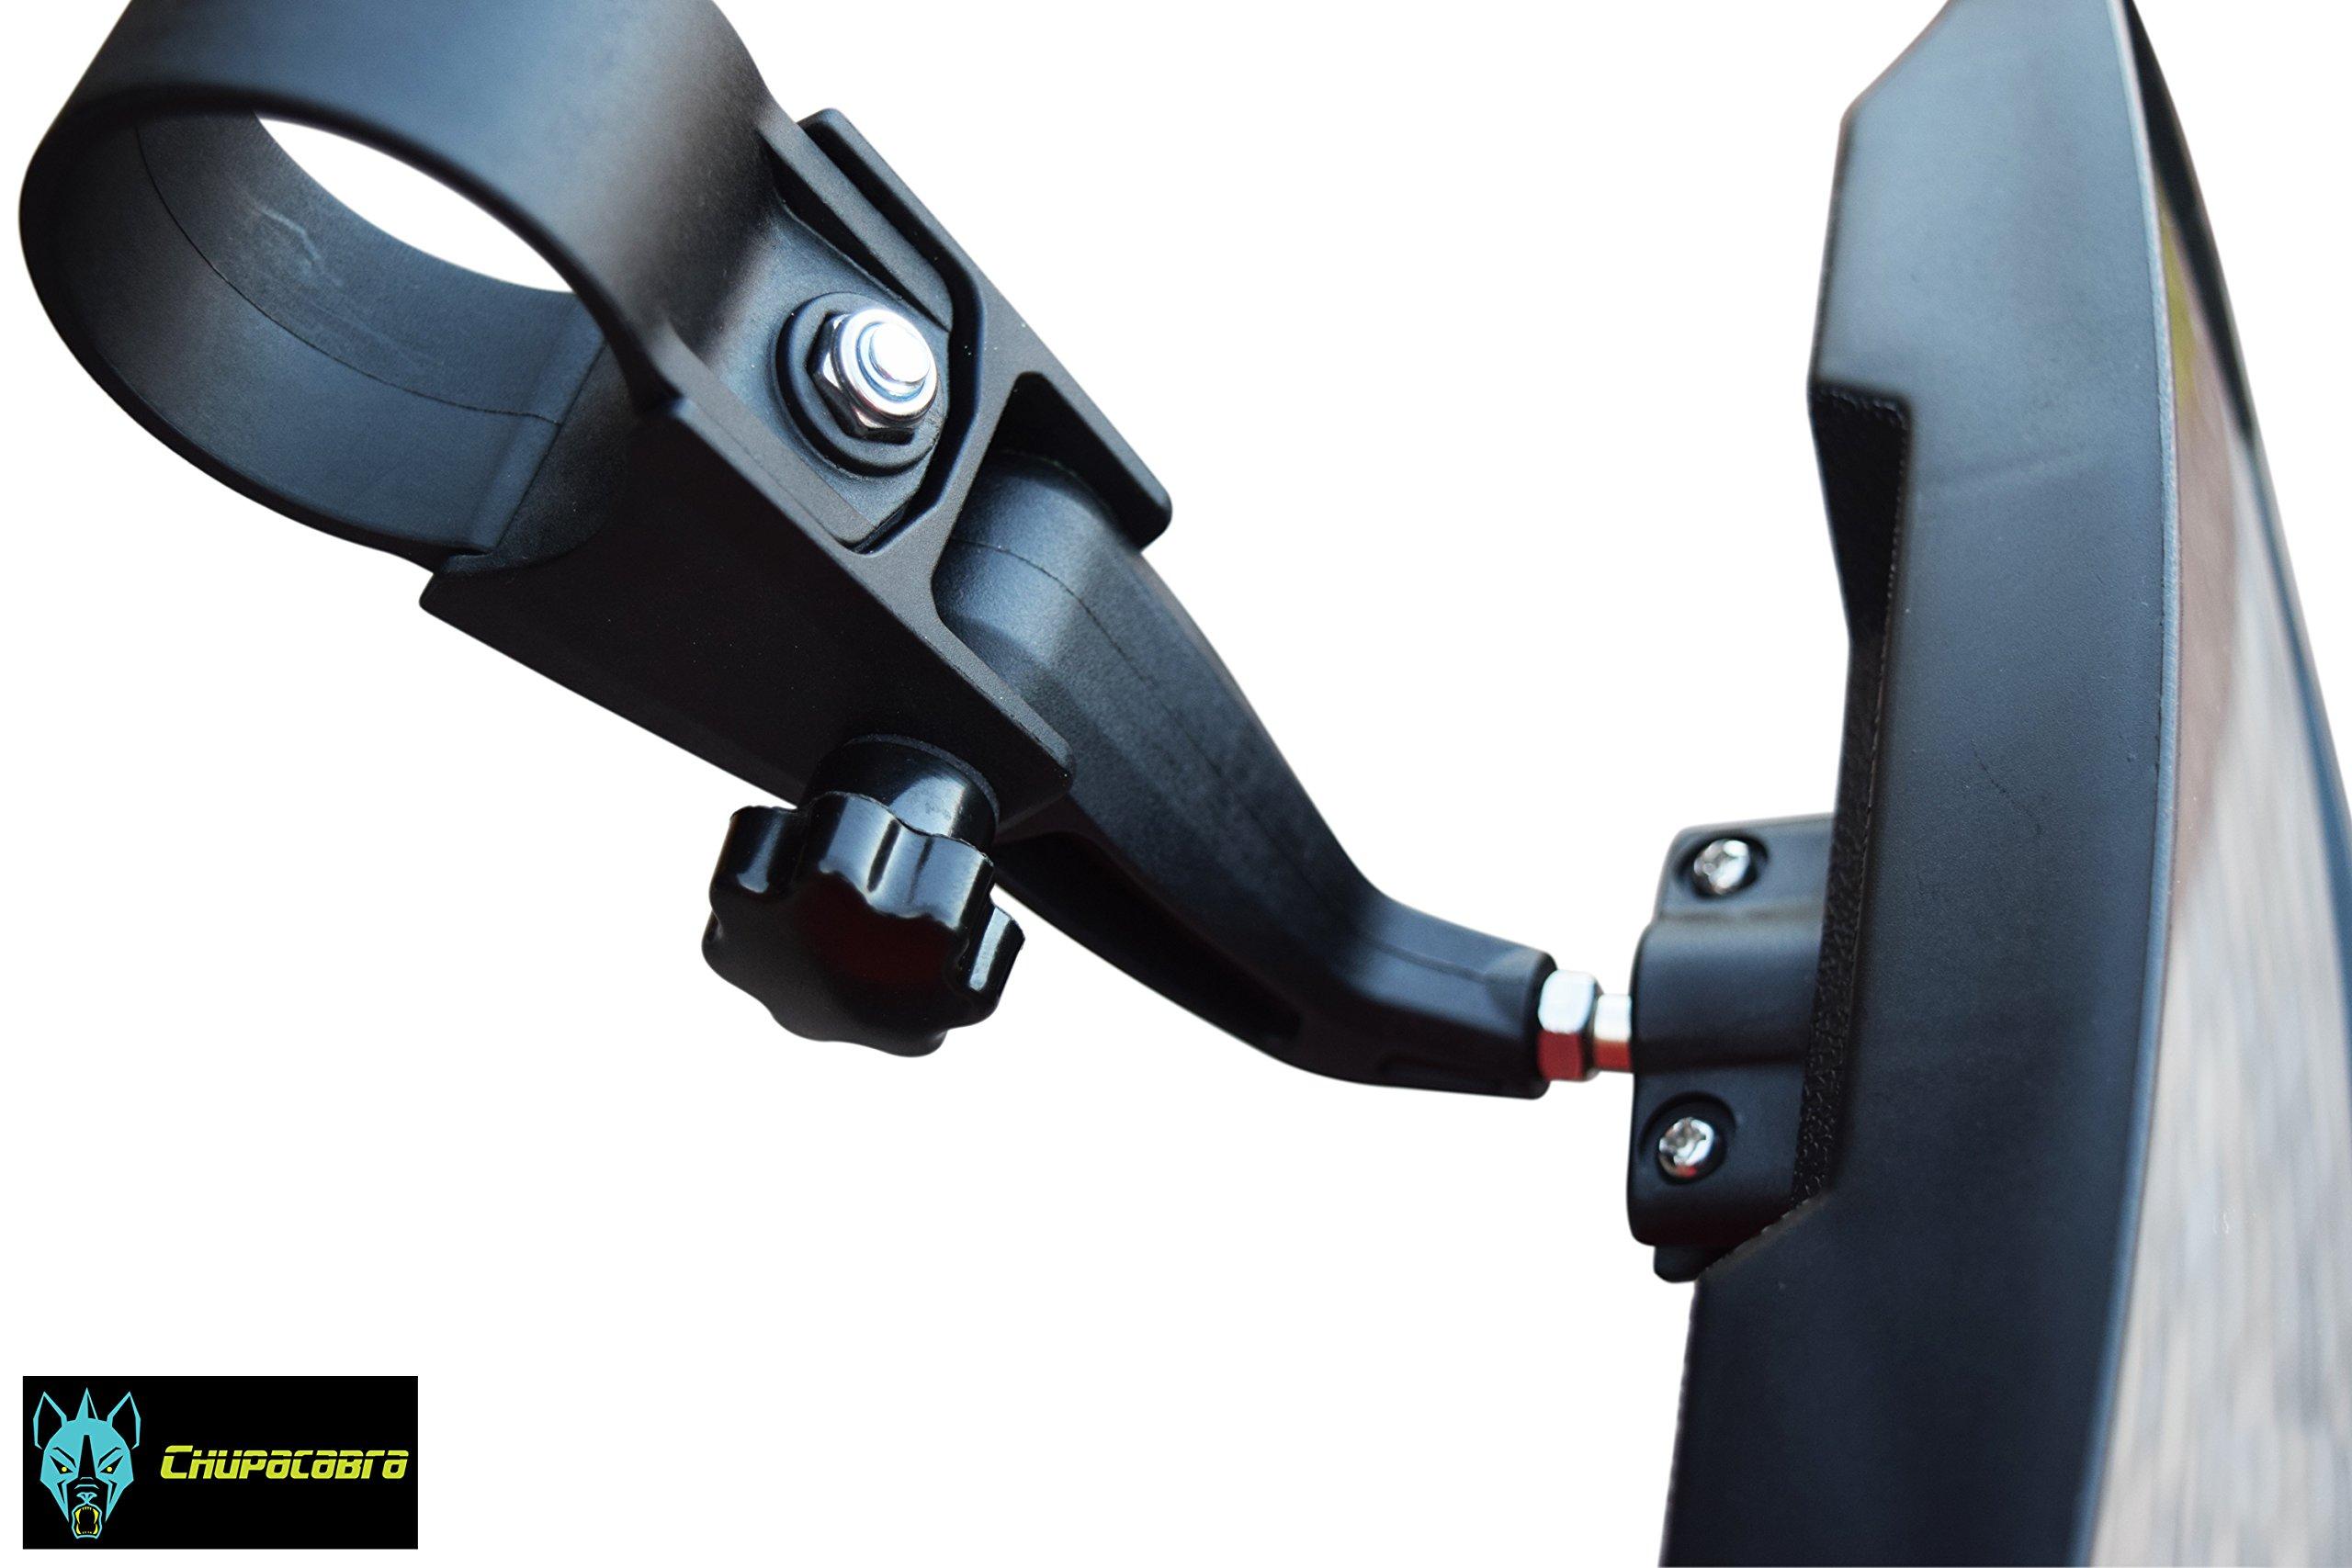 Chupacabra Offroad UTV Universal Rear View/Side View Mirror 1.75 clamp